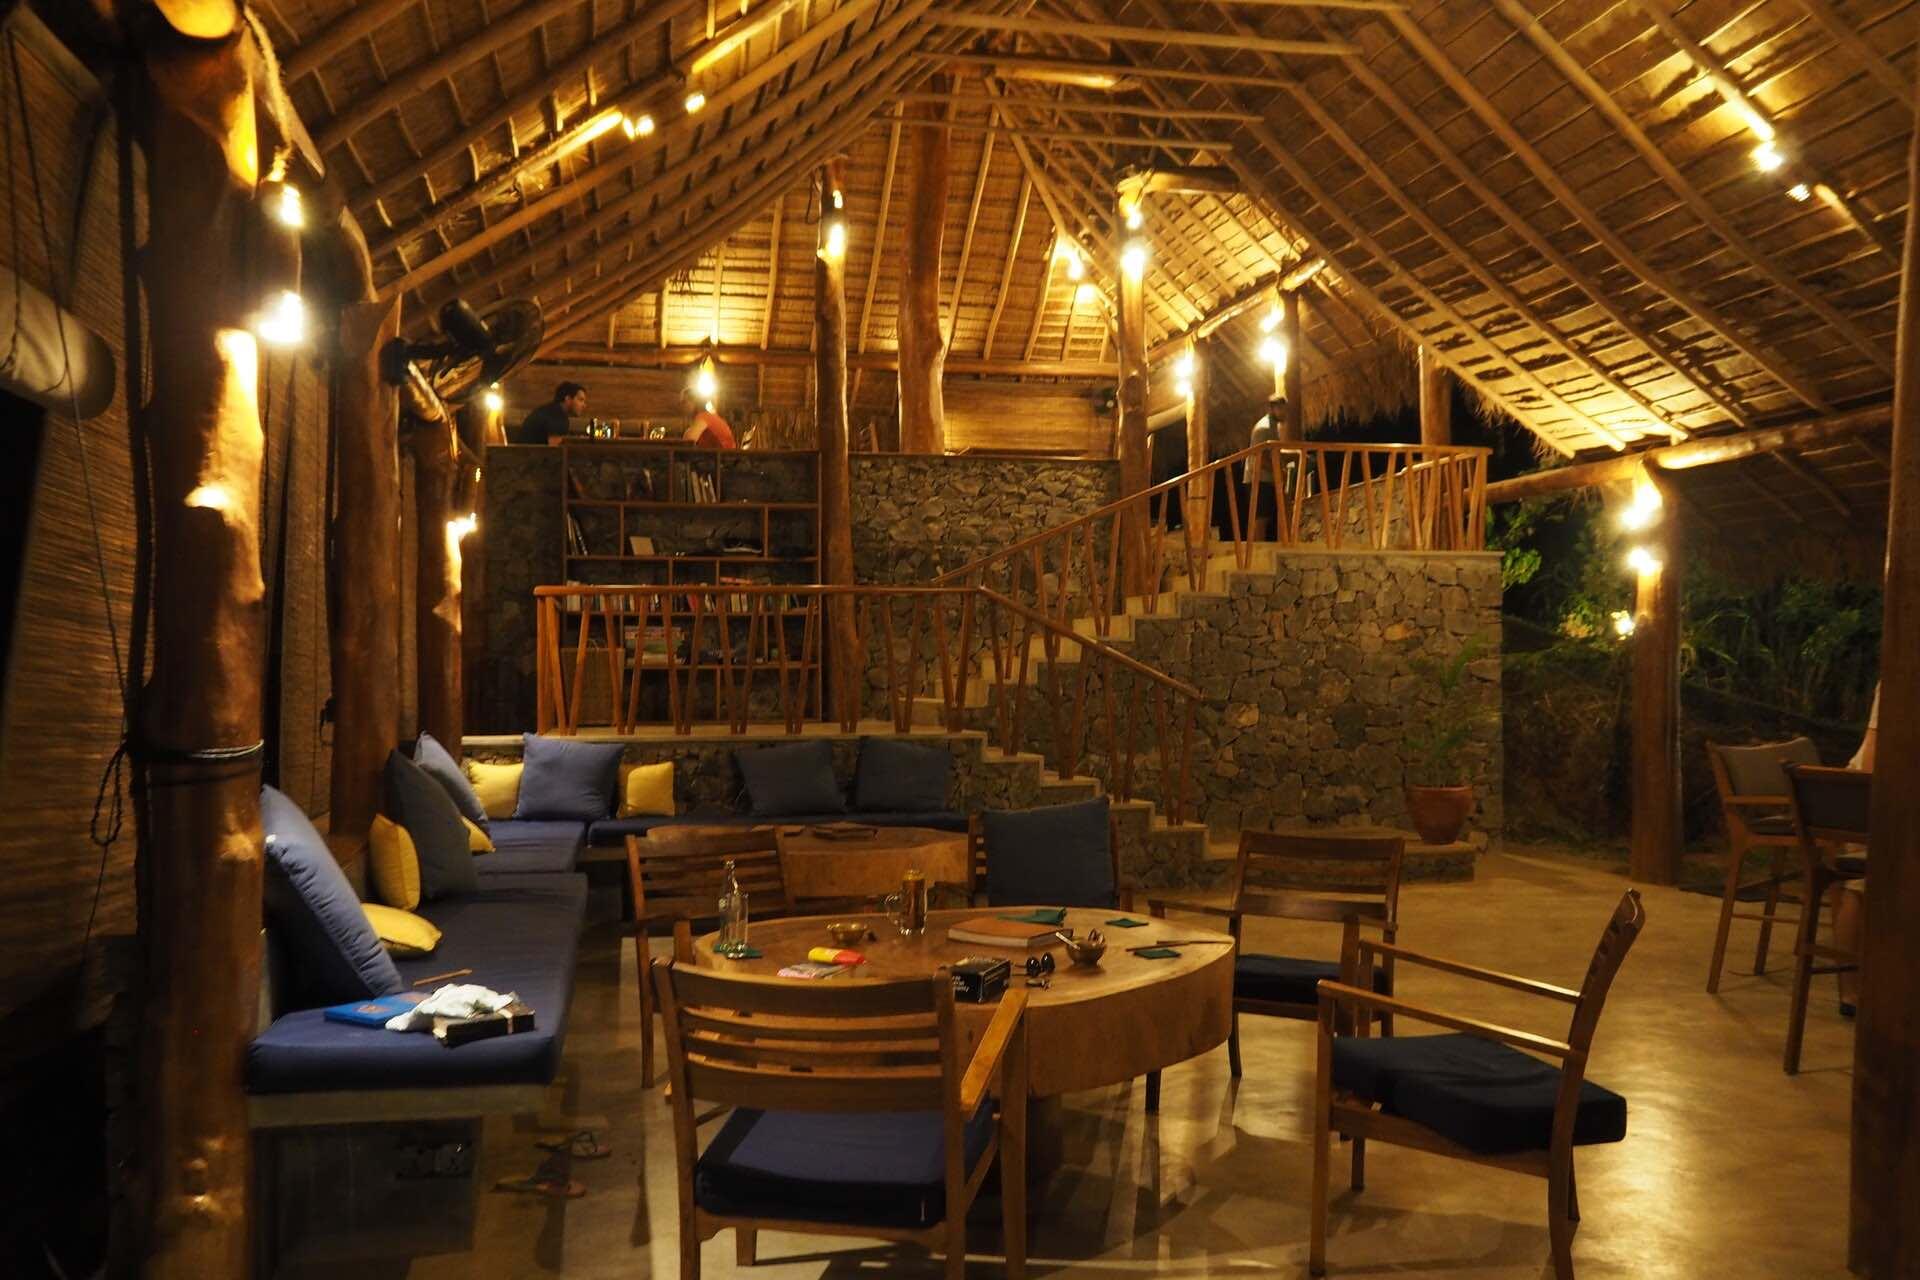 sri-lanka-gal-oya-reception-holiday-review-feedback-invite-to-paradise-quentin-kate-hulm.jpg